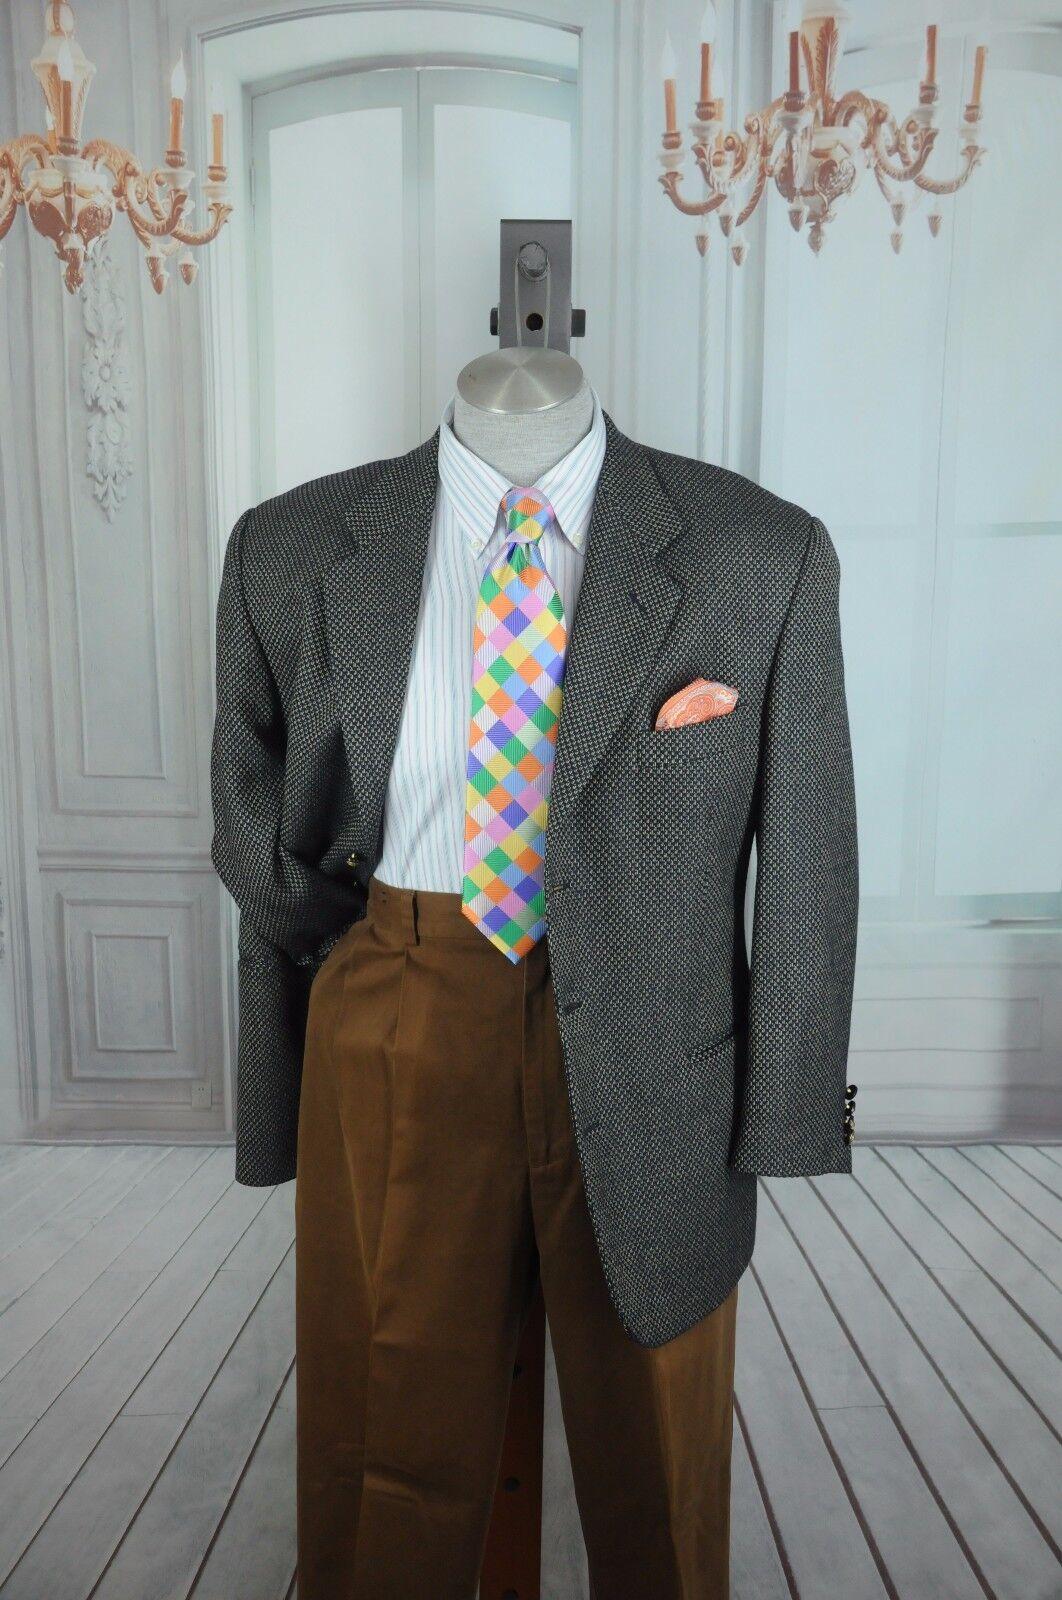 Paolo Visto Herren Marineblau & Hellbraun Dobby Wolle Sport Mantel Blazer 40 R    | Rabatt  | Elegantes Aussehen  | New Product 2019